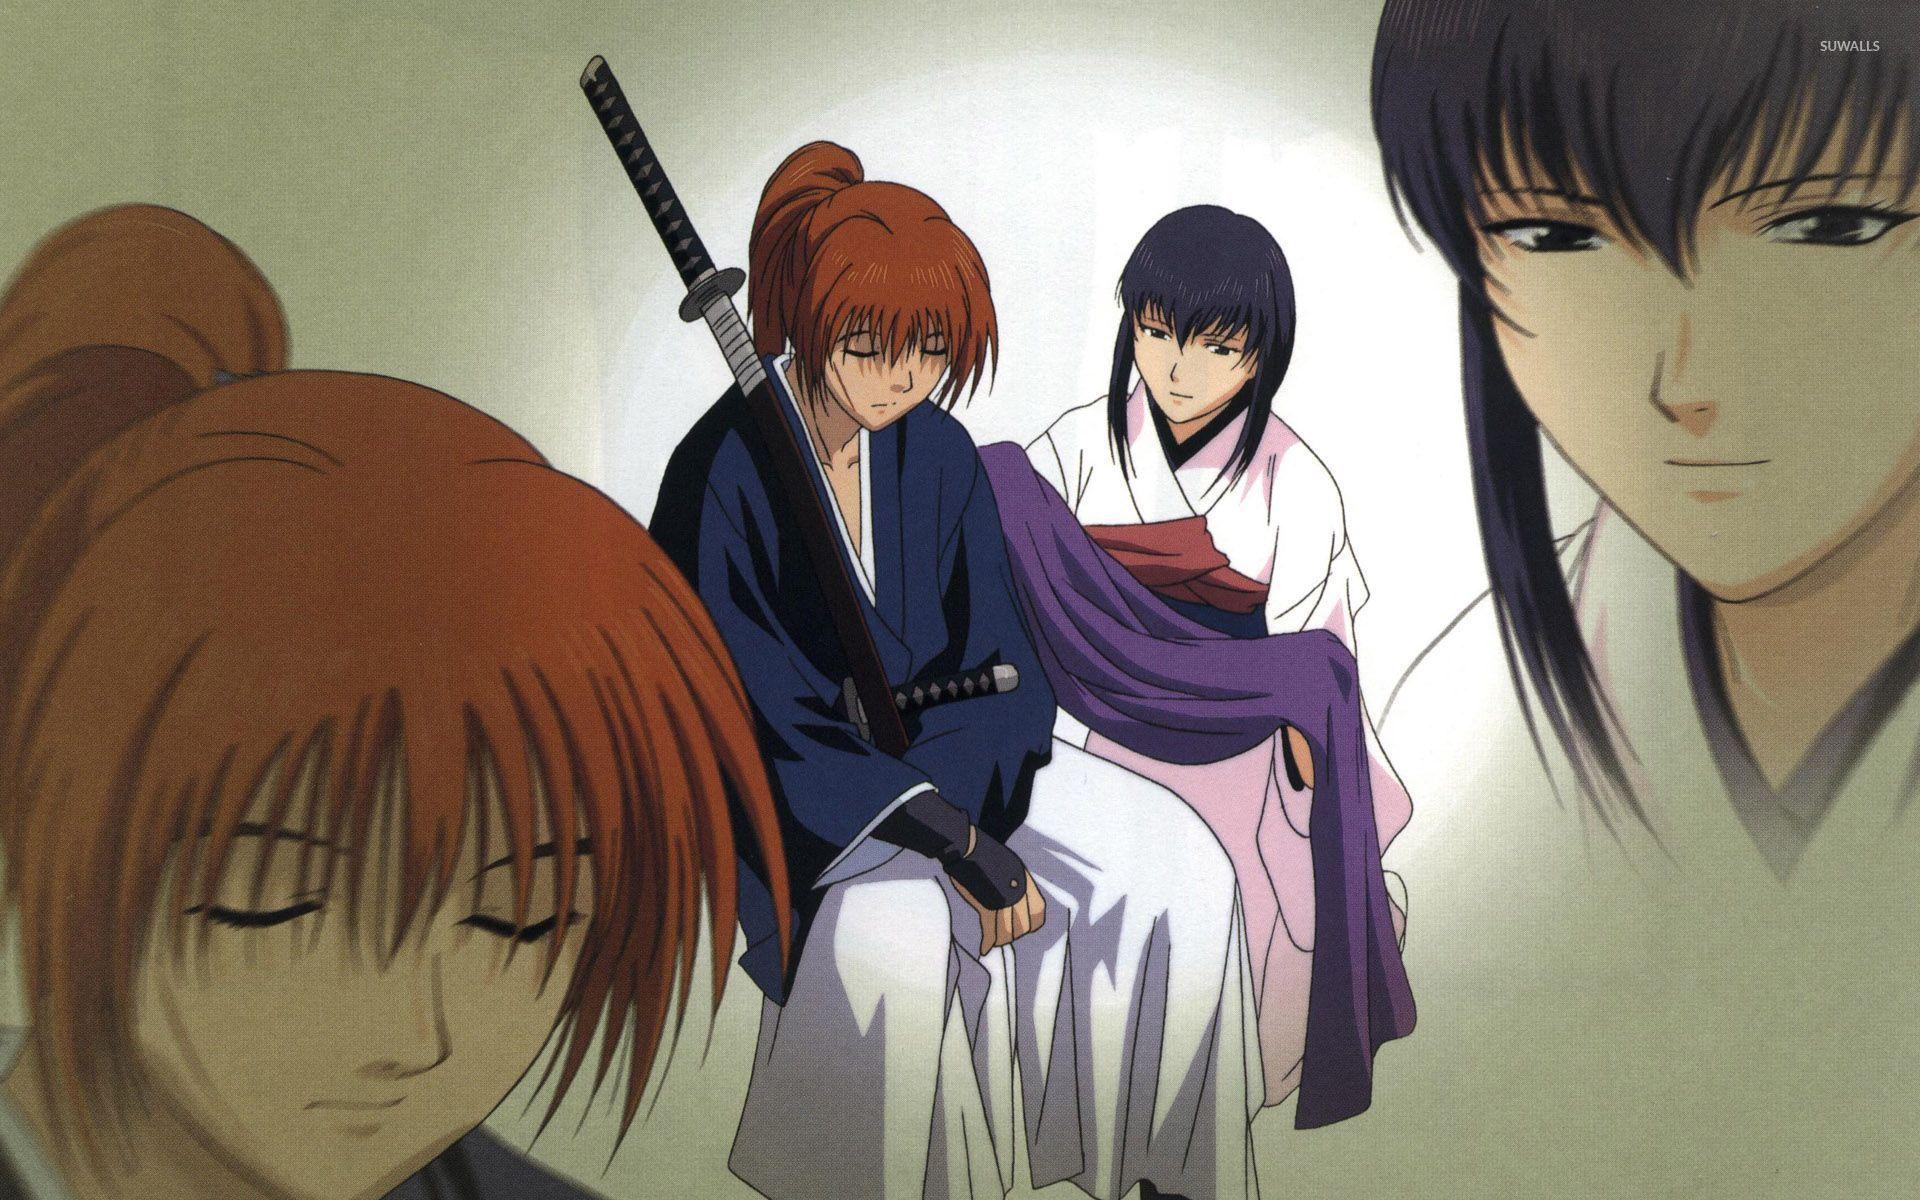 Himura And Kamiya Samurai X Wallpaper Anime Wallpapers